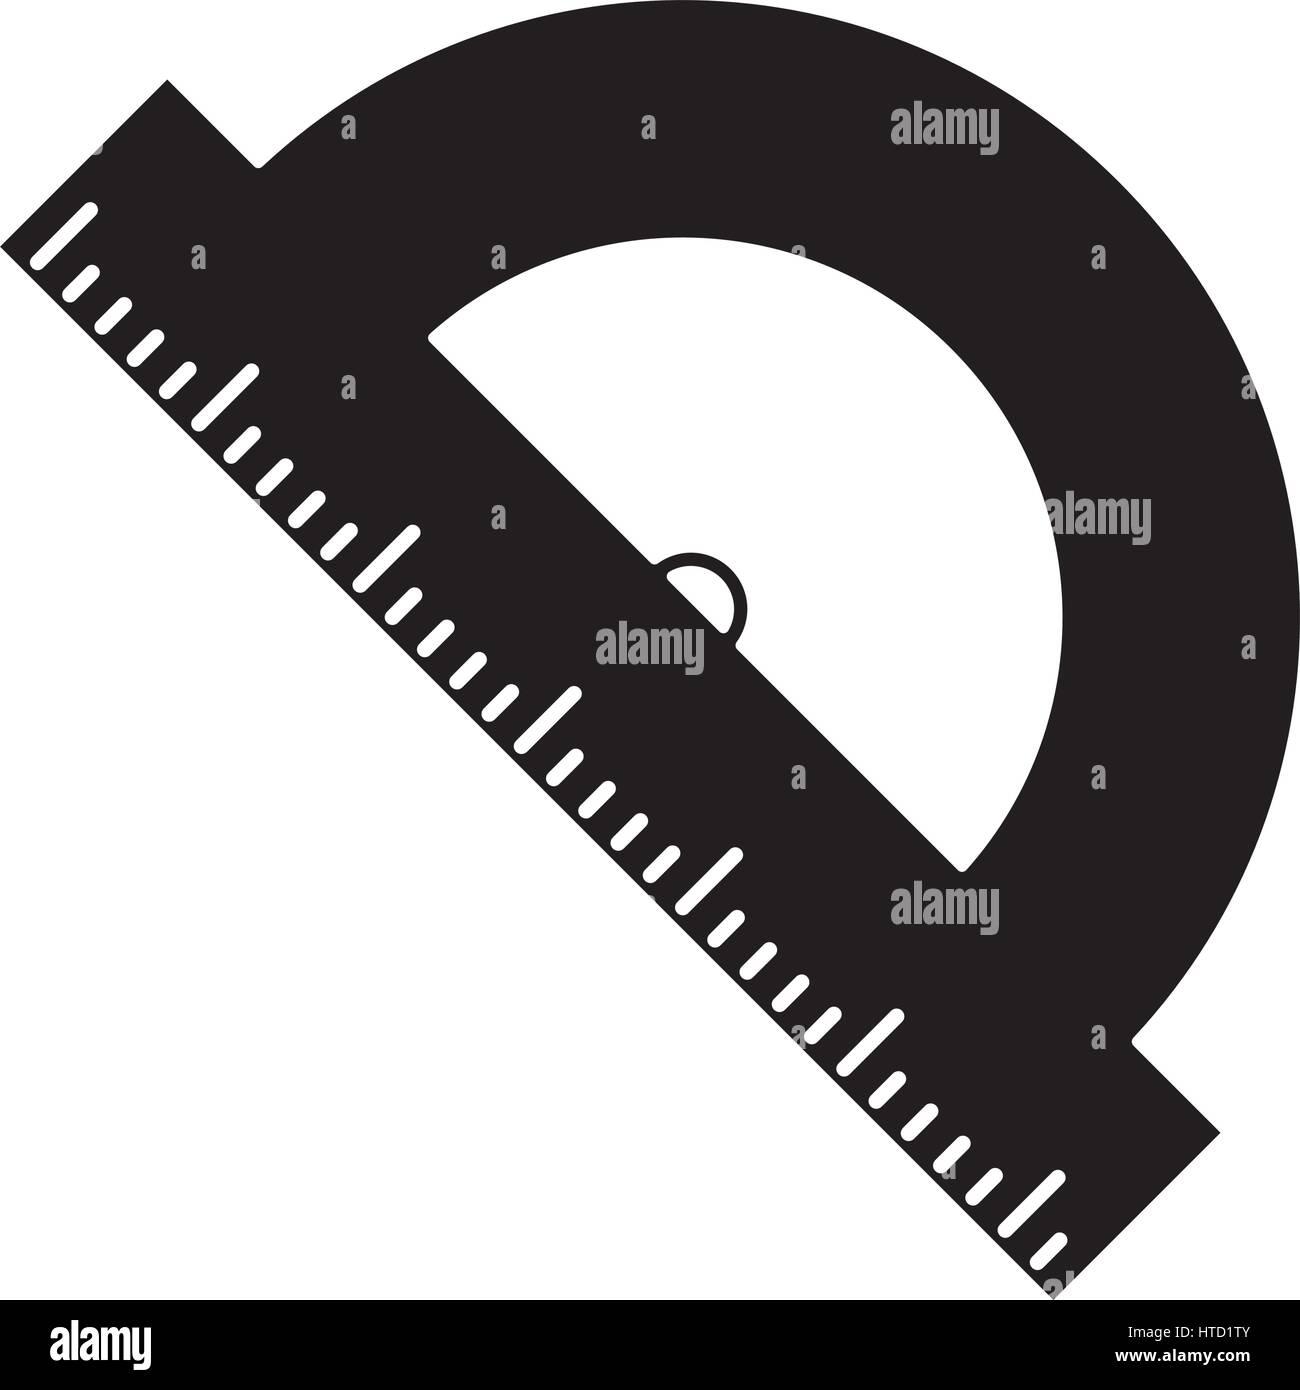 geometry protactor school pictogram - Stock Image